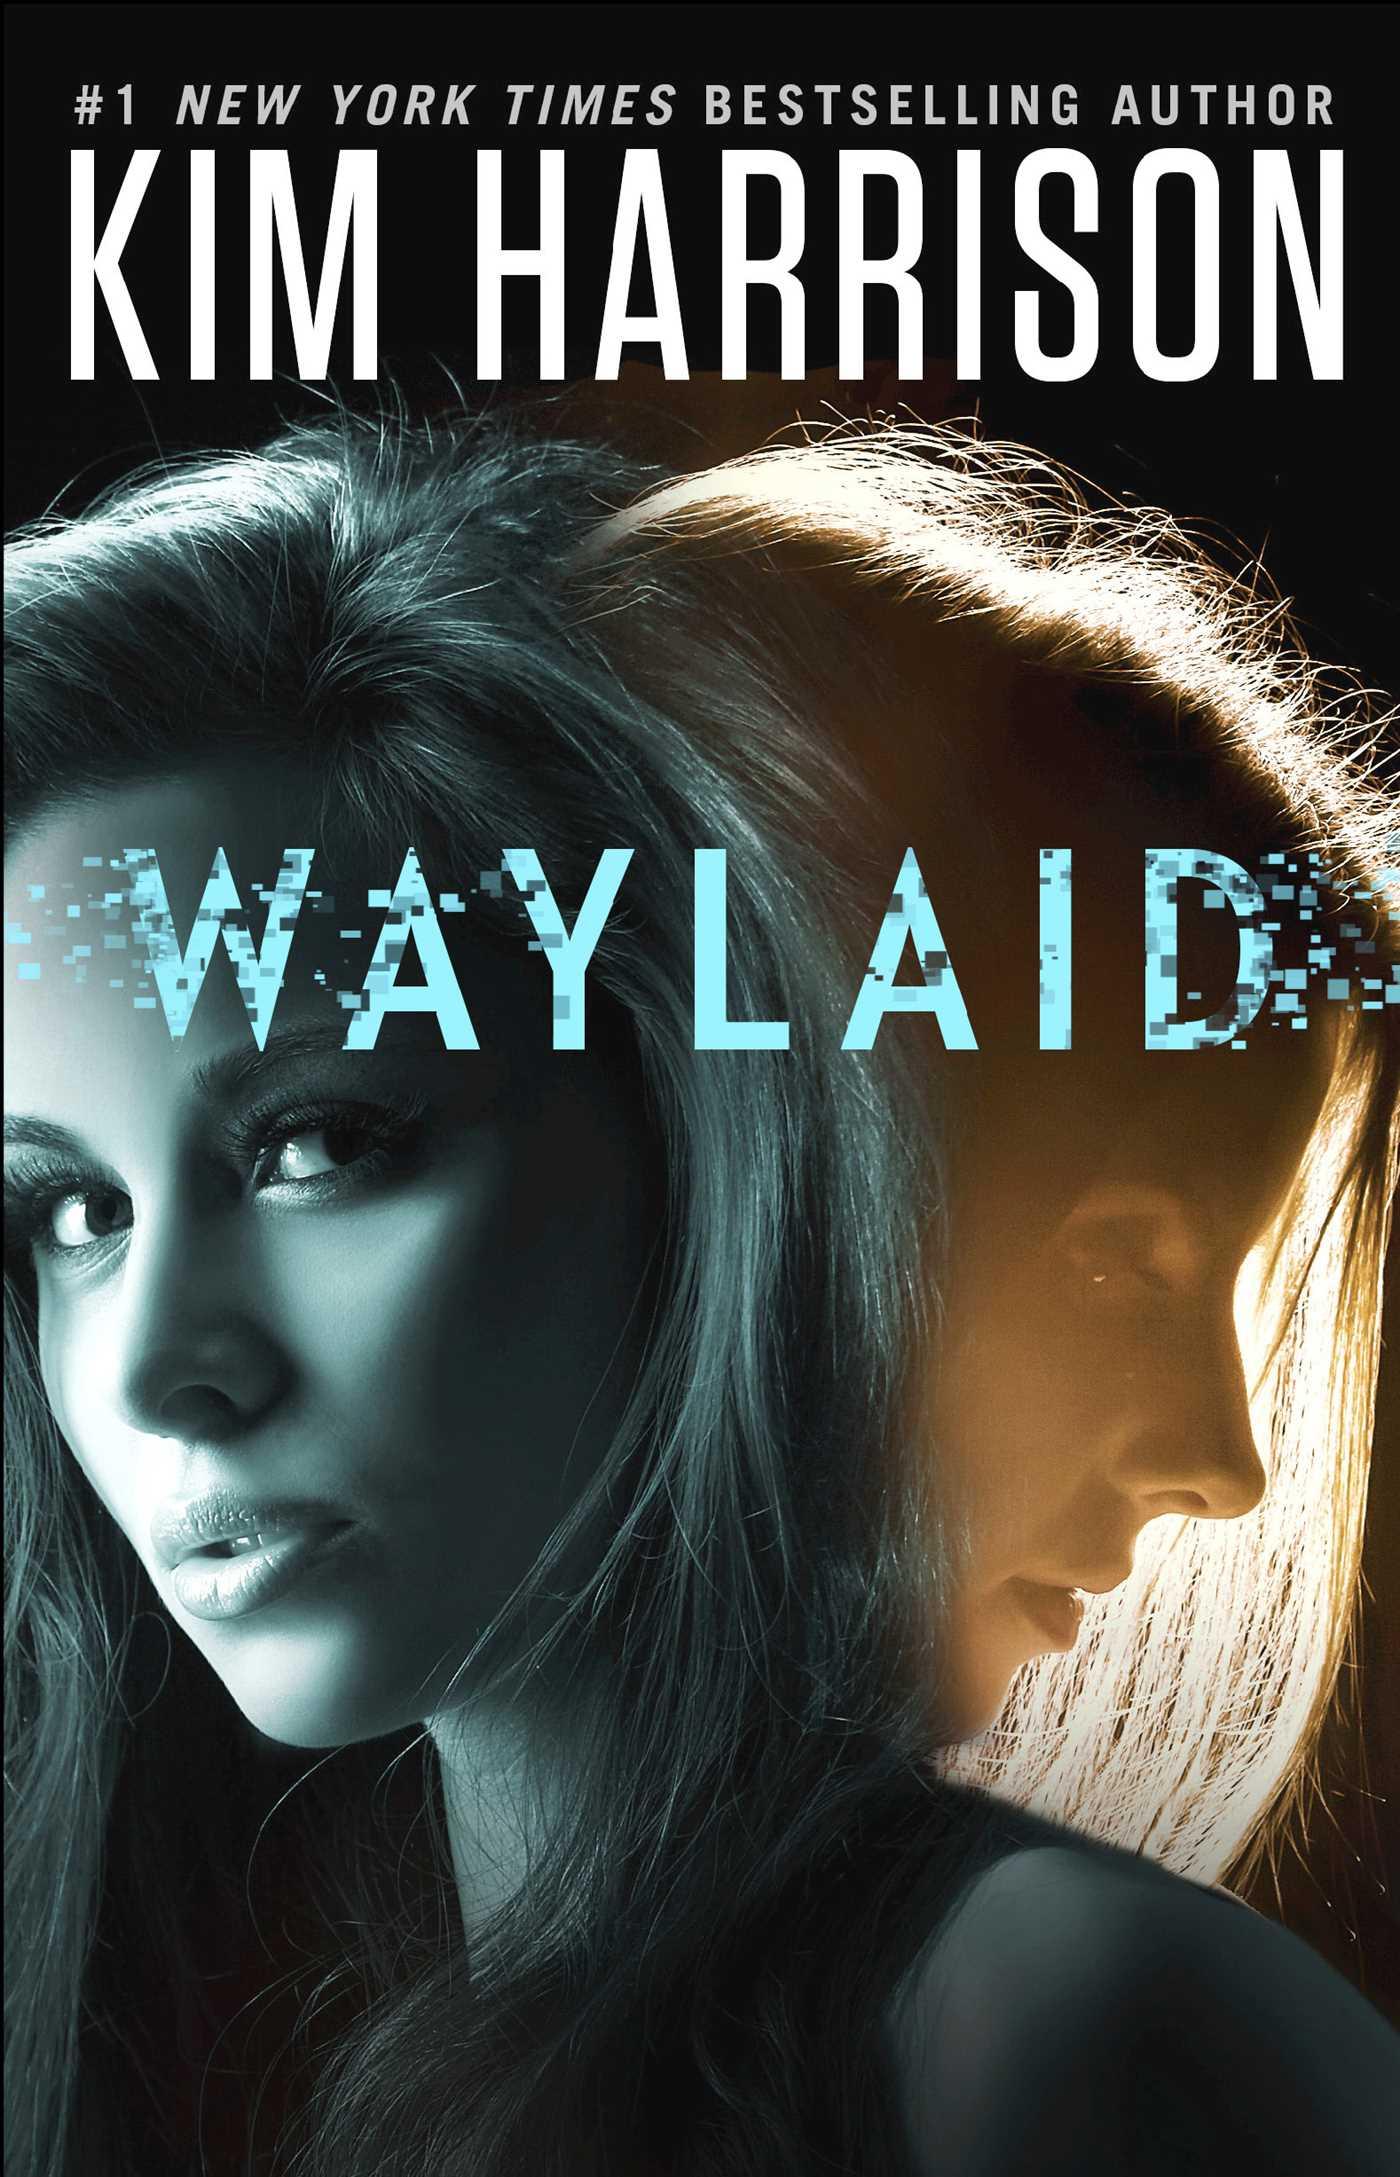 Waylaid 9781501145551 hr